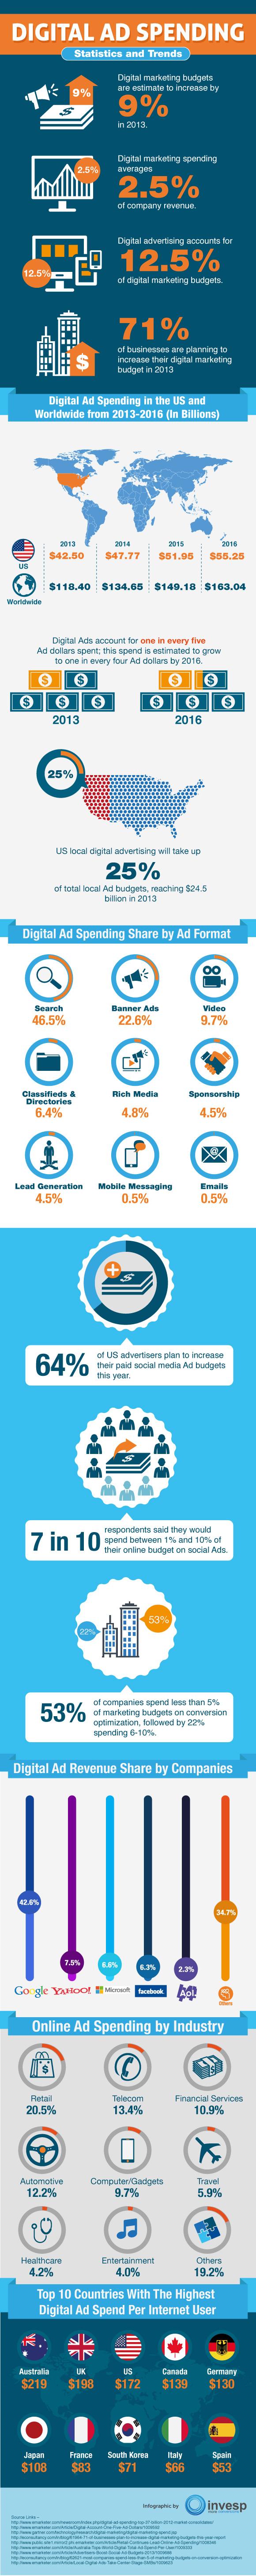 Digital Ad Spending – Statistics and Trends